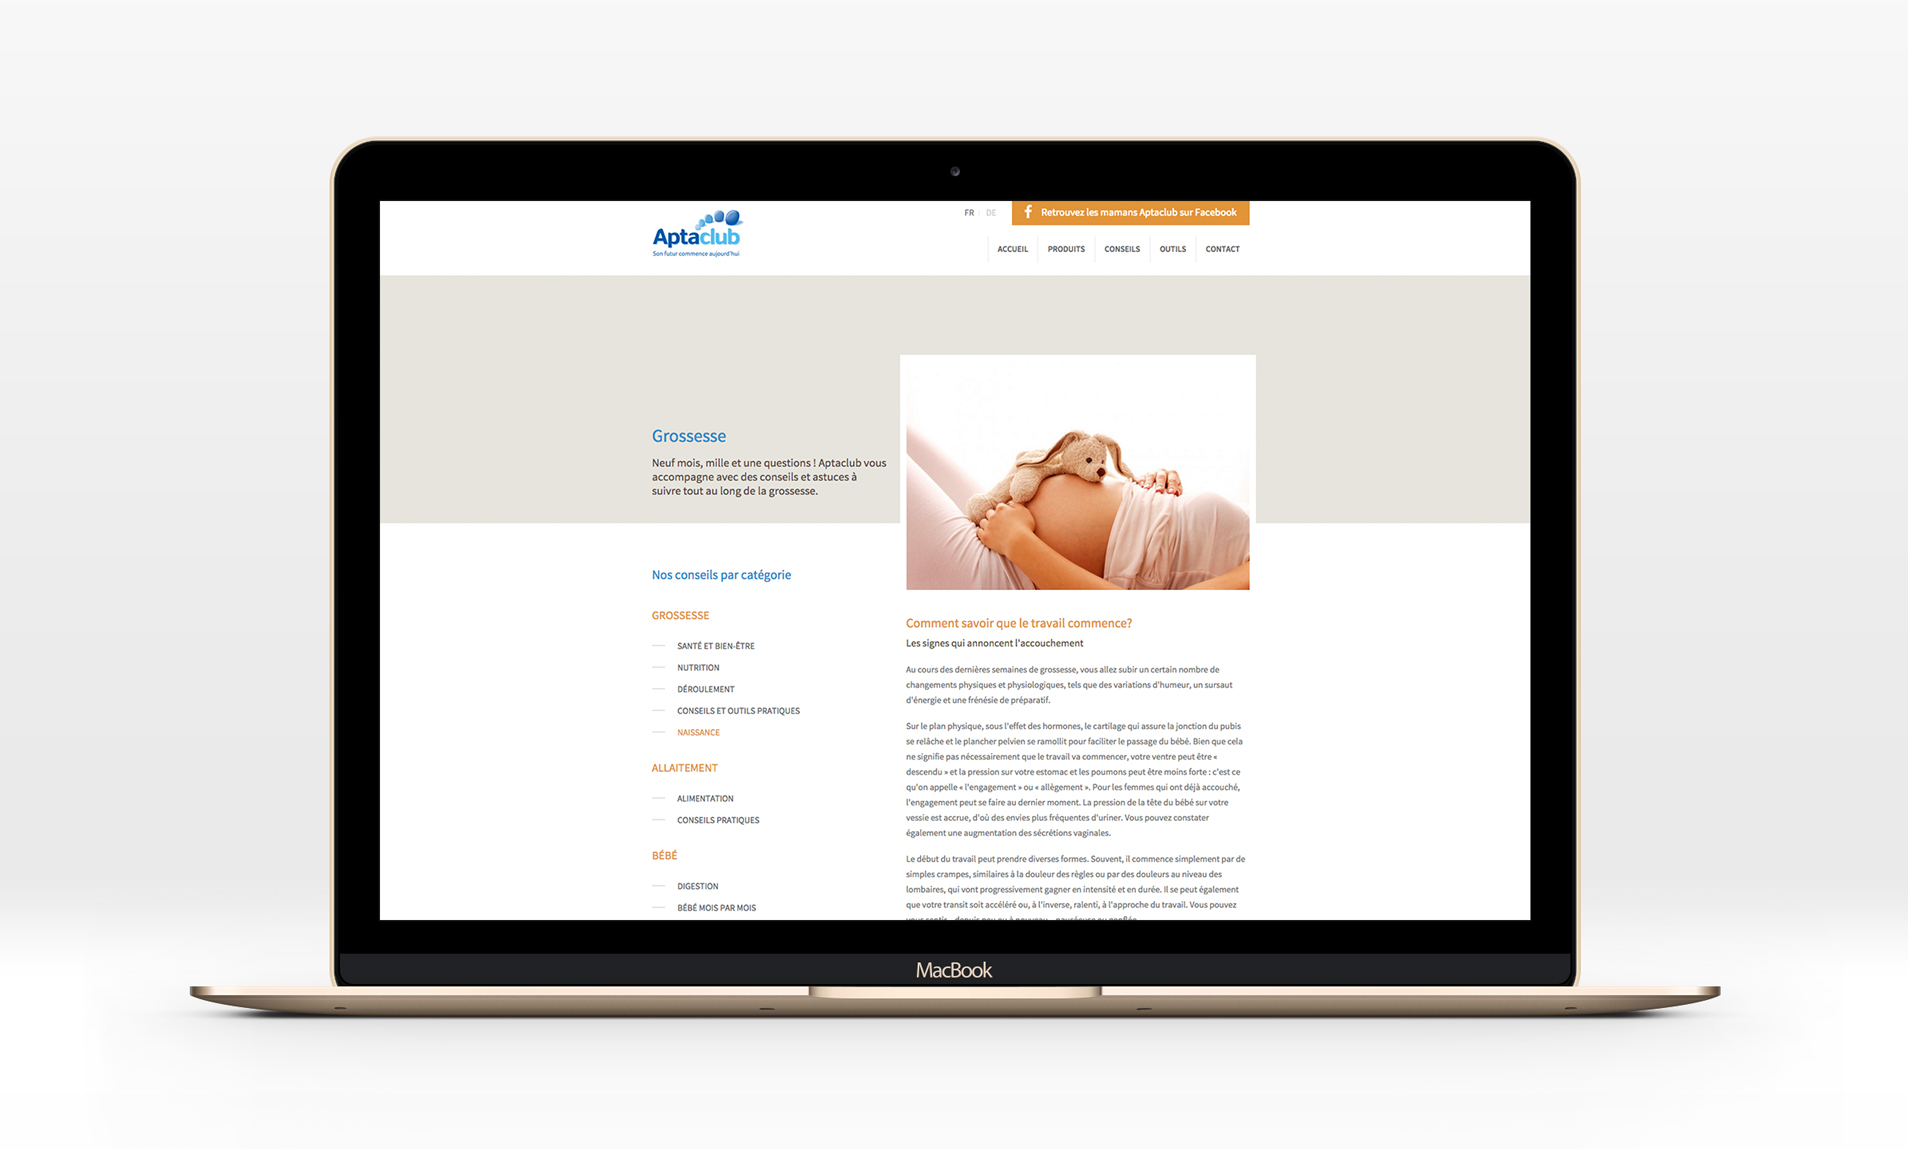 Website Aptaclub on a laptop display